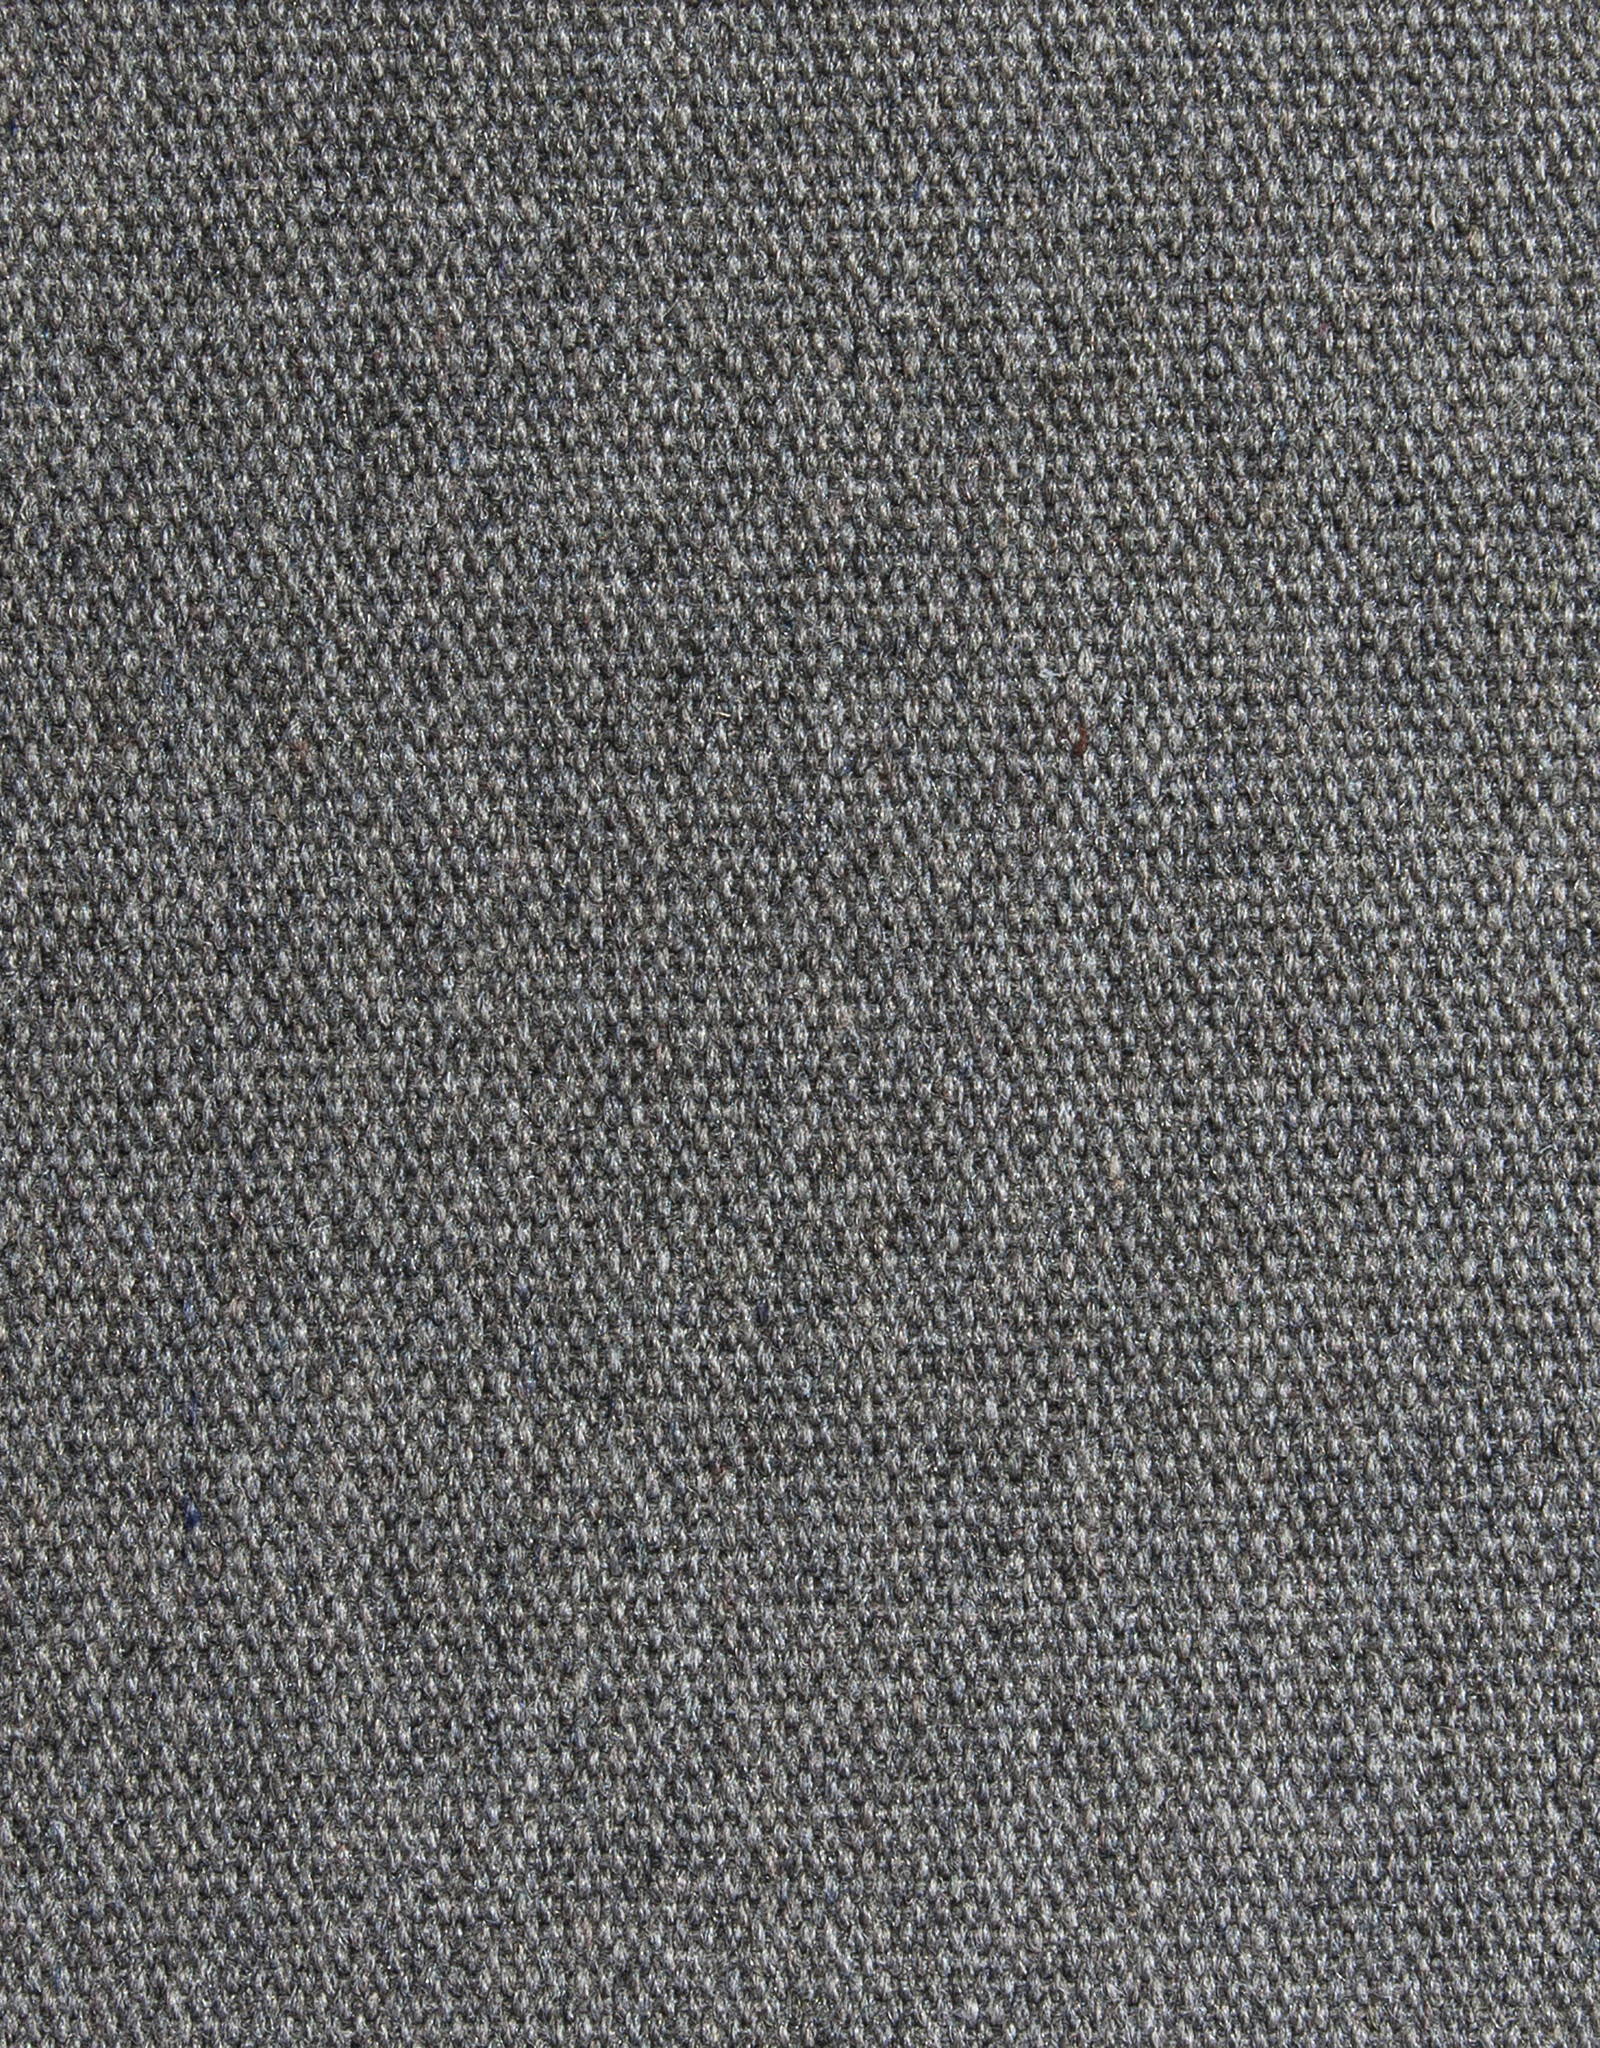 Bryck Bryck - couch 2 zit - Ecollection - medium grey